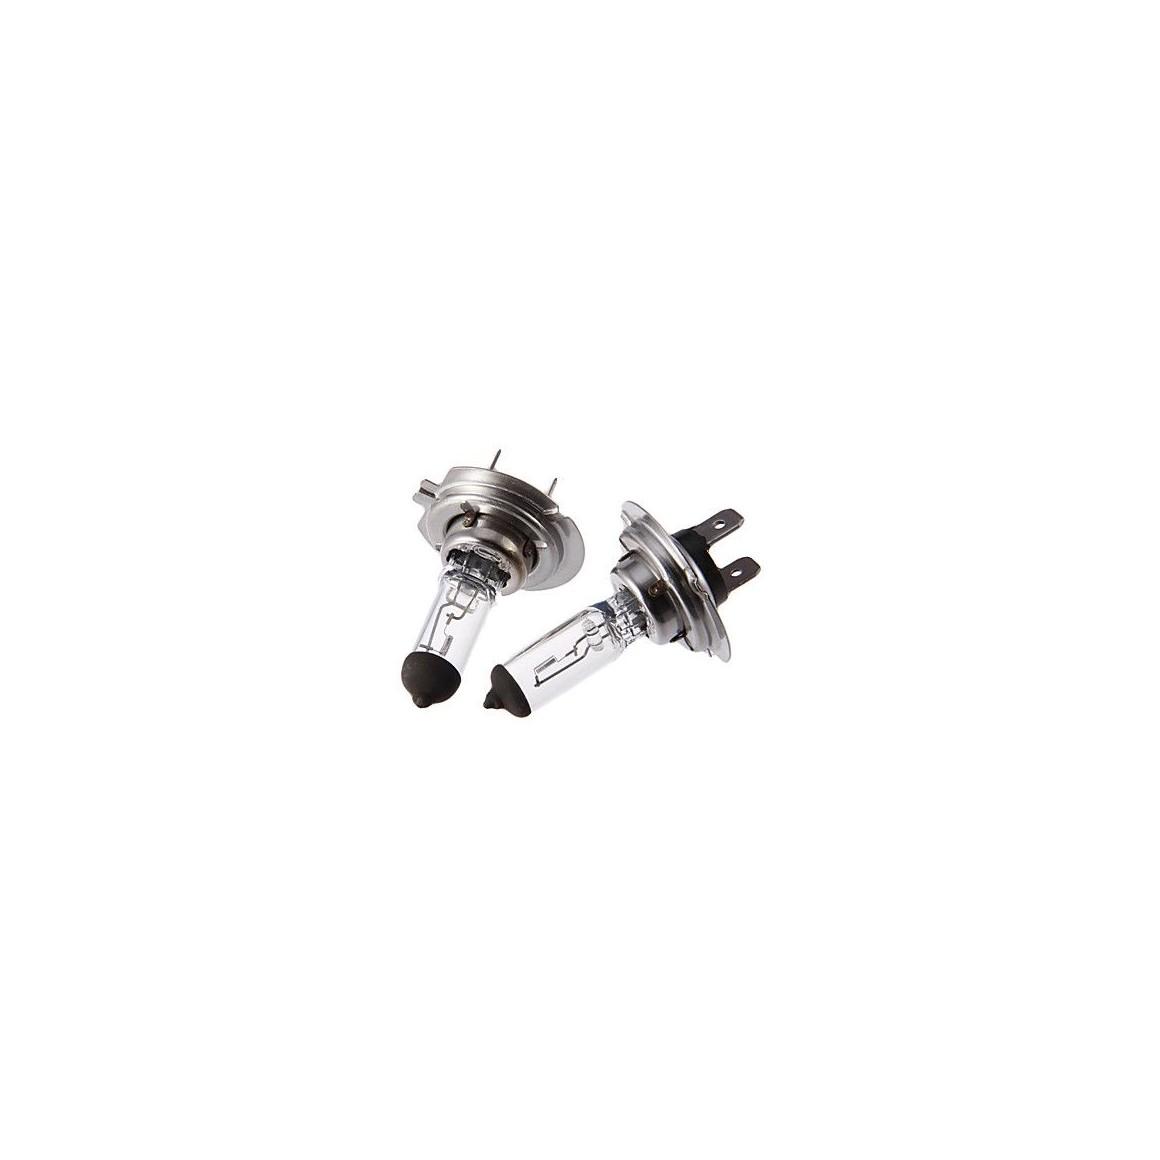 2 x Ampoules H4 65/55W 12V ORIGINE - FRANCE-XENON